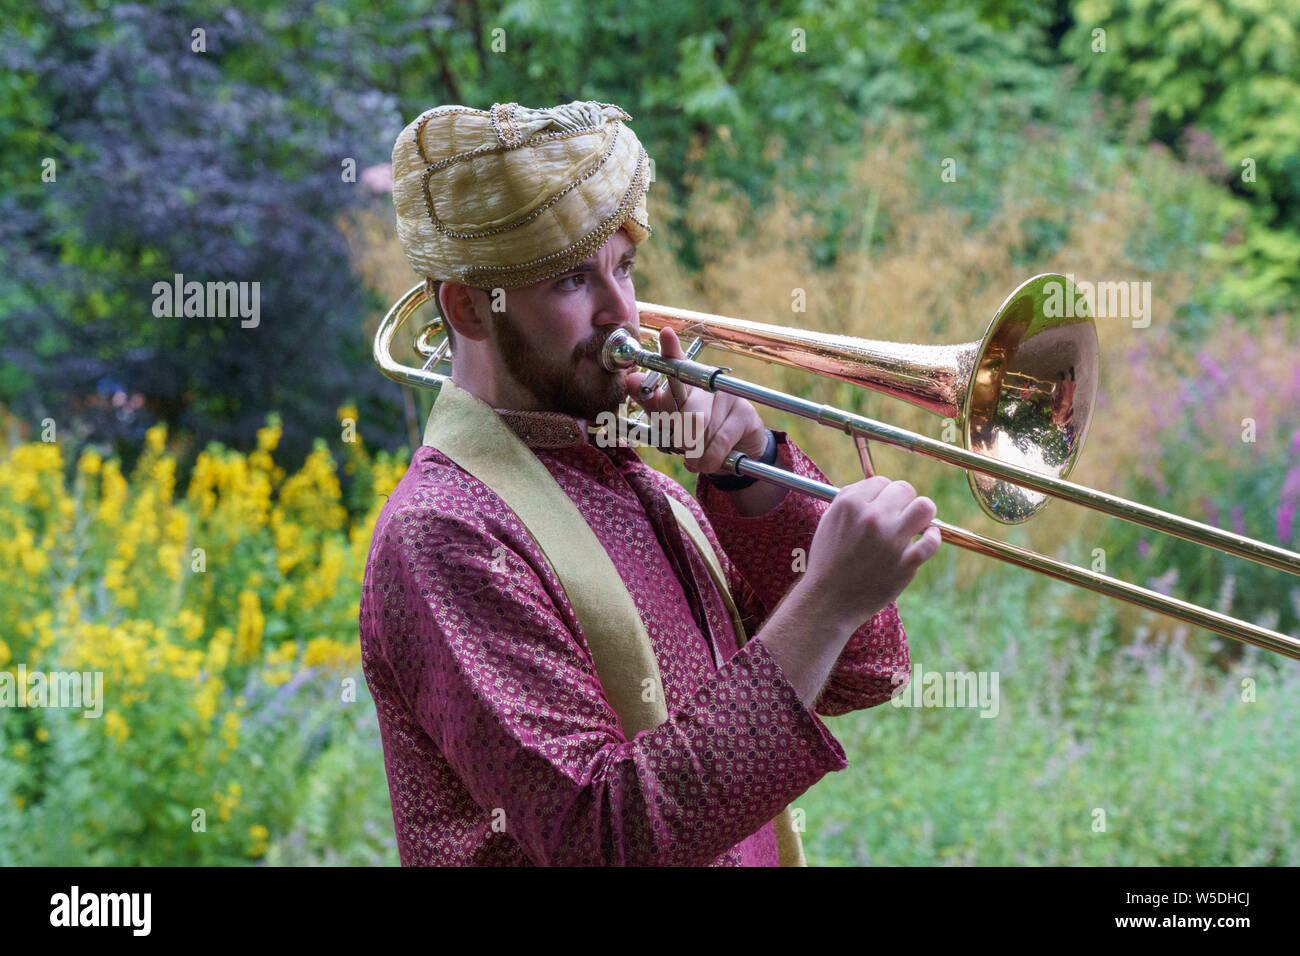 Trombone Player from The Bombay Baja Brass Band, Valley Gardens, Harrogate, North Yorkshire, England, UK. Stock Photo